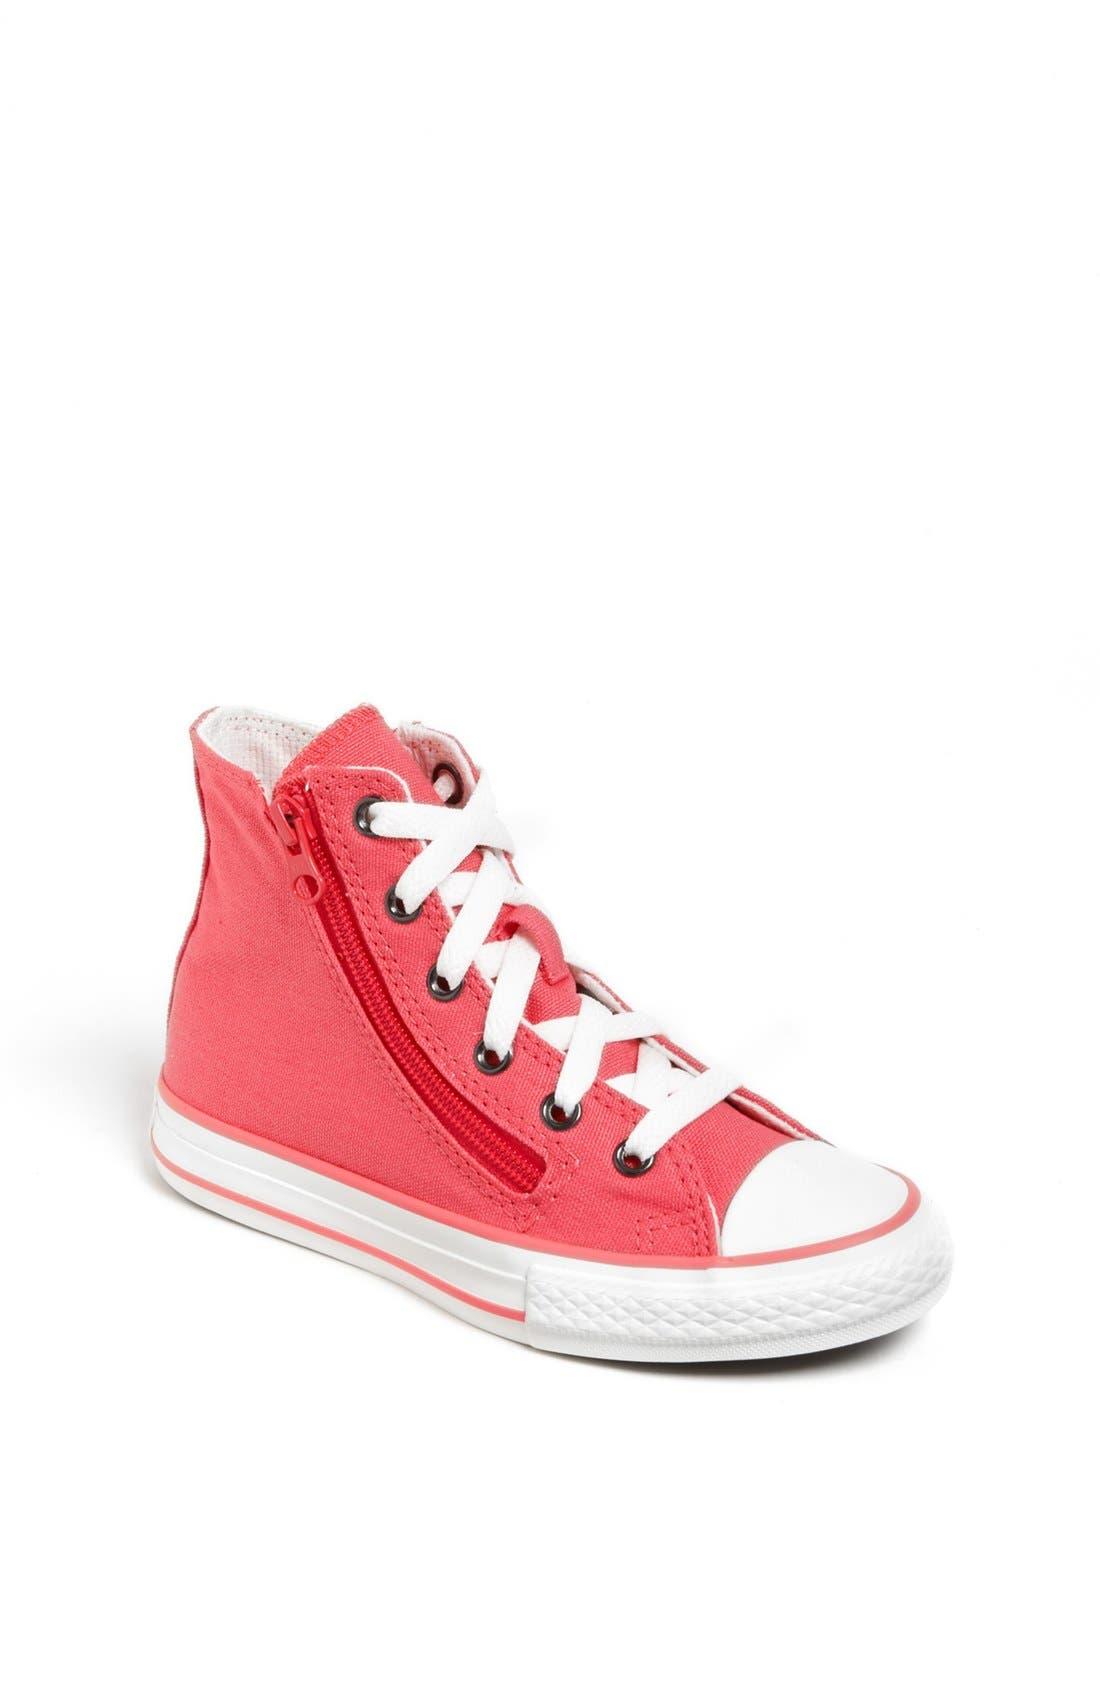 Main Image - Converse Chuck Taylor® All Star® High Top Sneaker (Toddler, Little Kid & Big Kid)